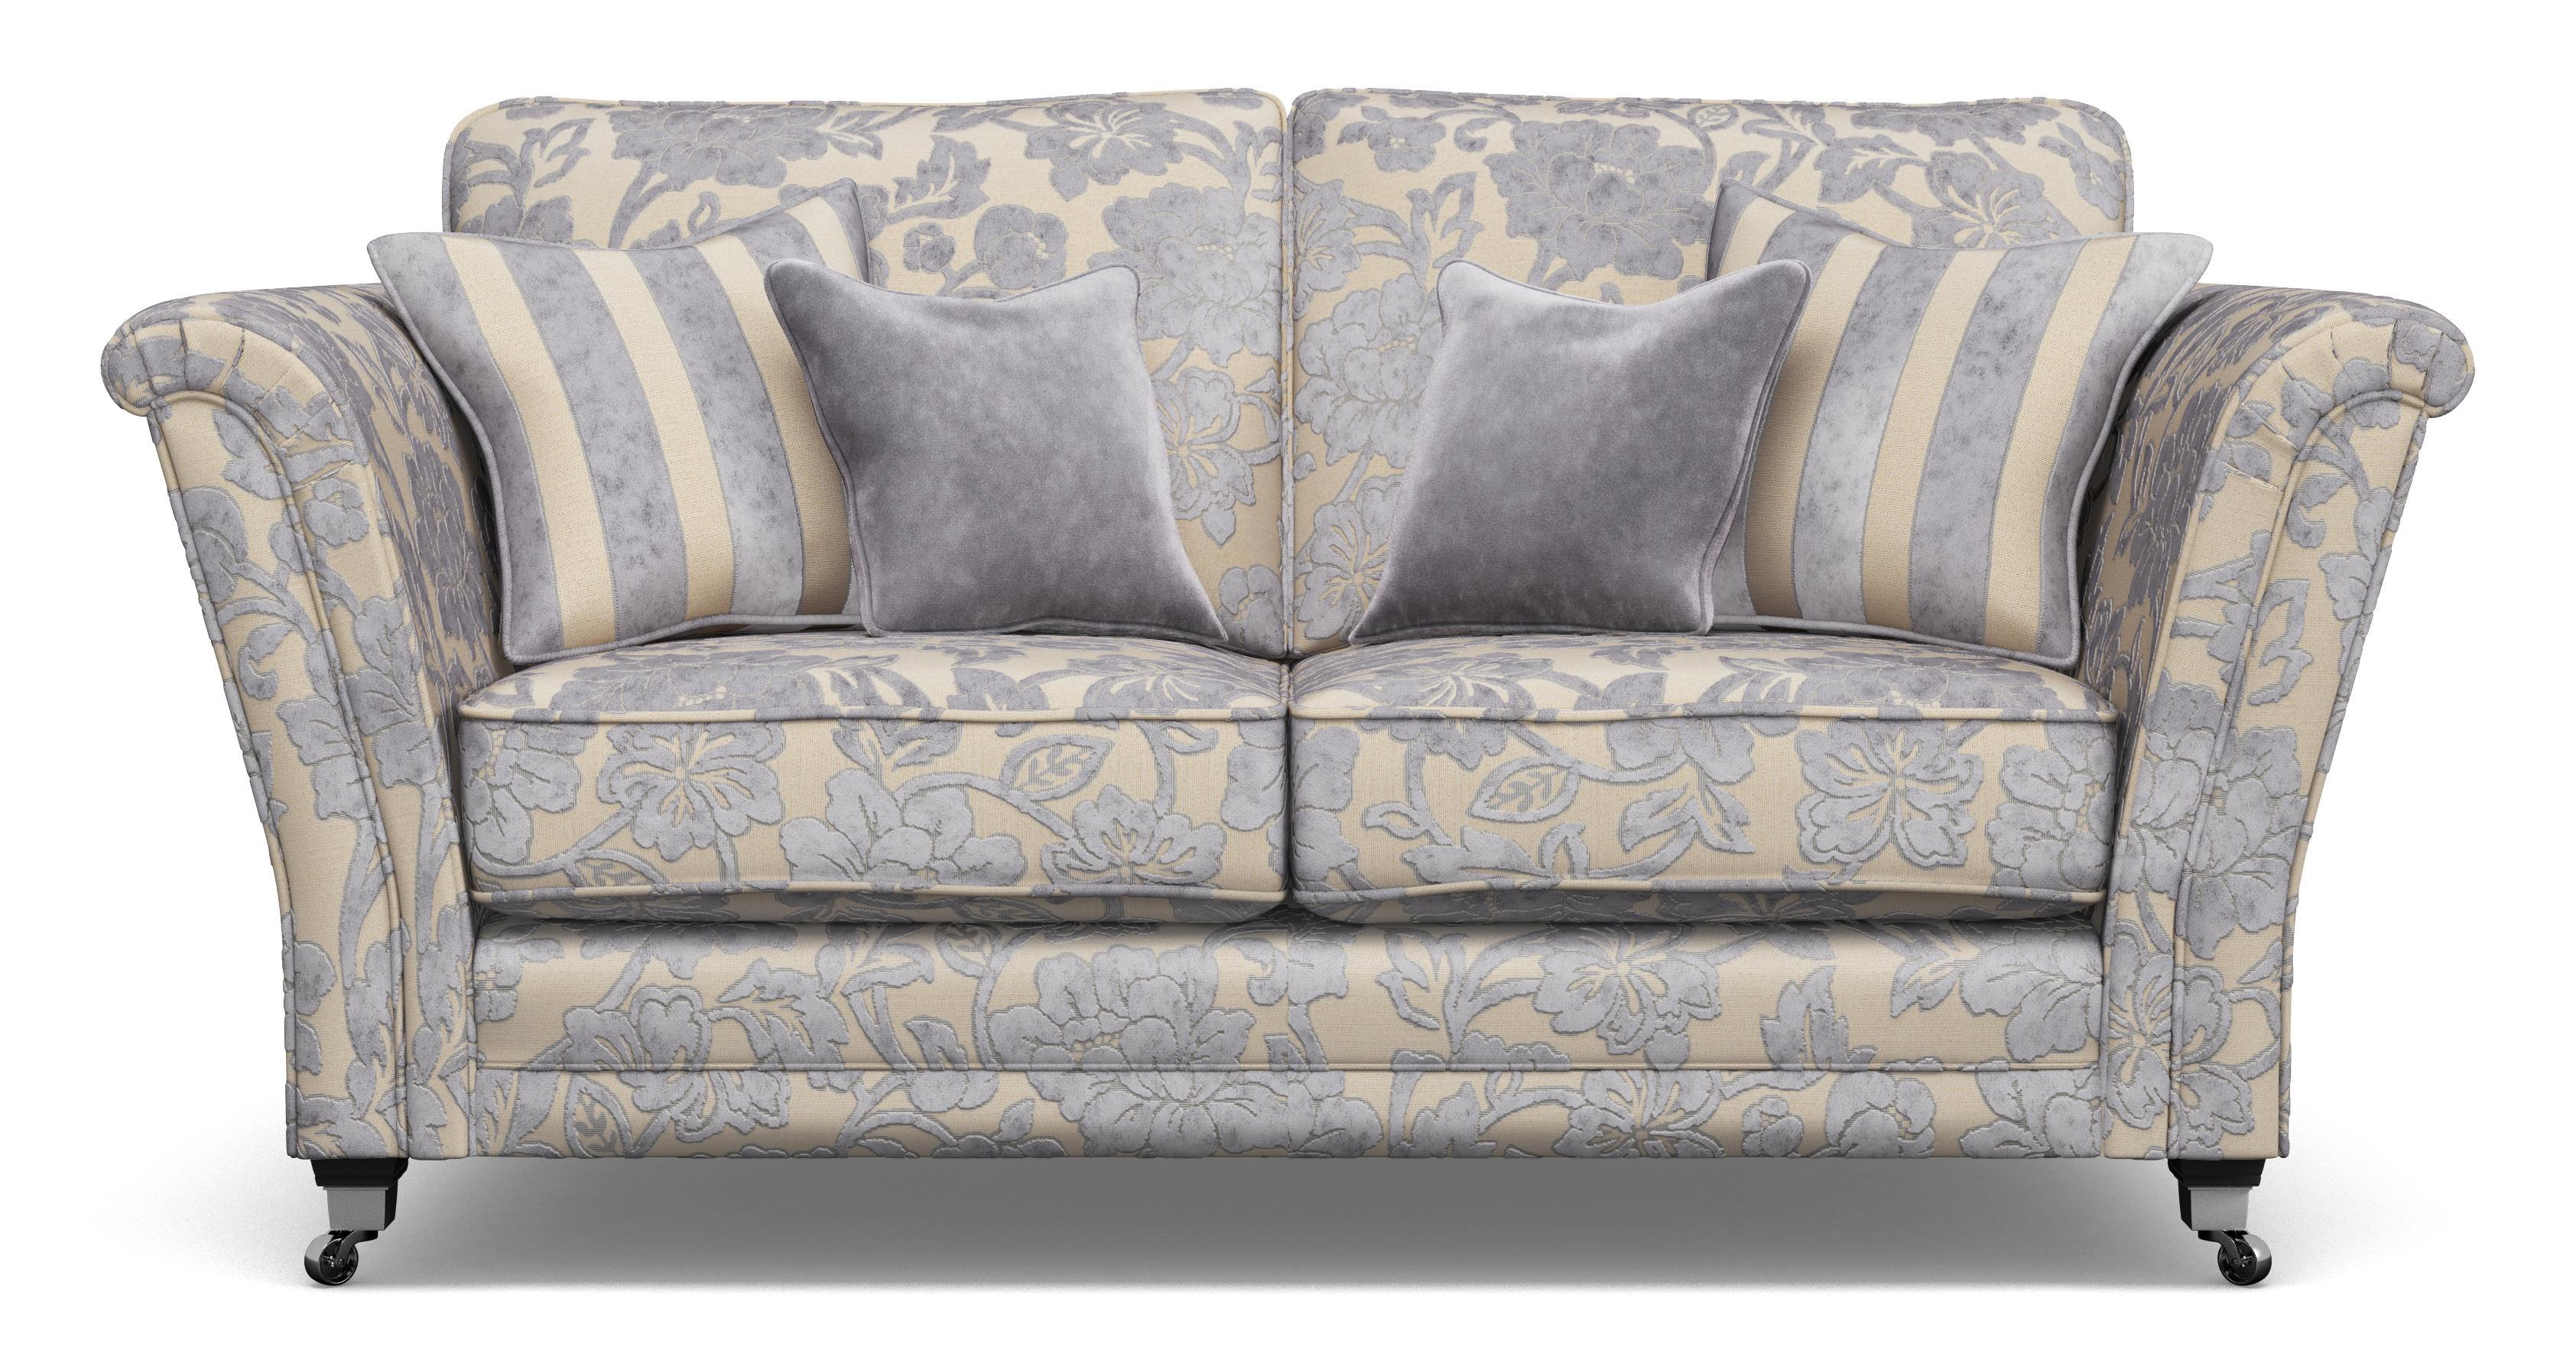 Hogarth Floral 2 Seater Sofa Hogarth Floral Dfs